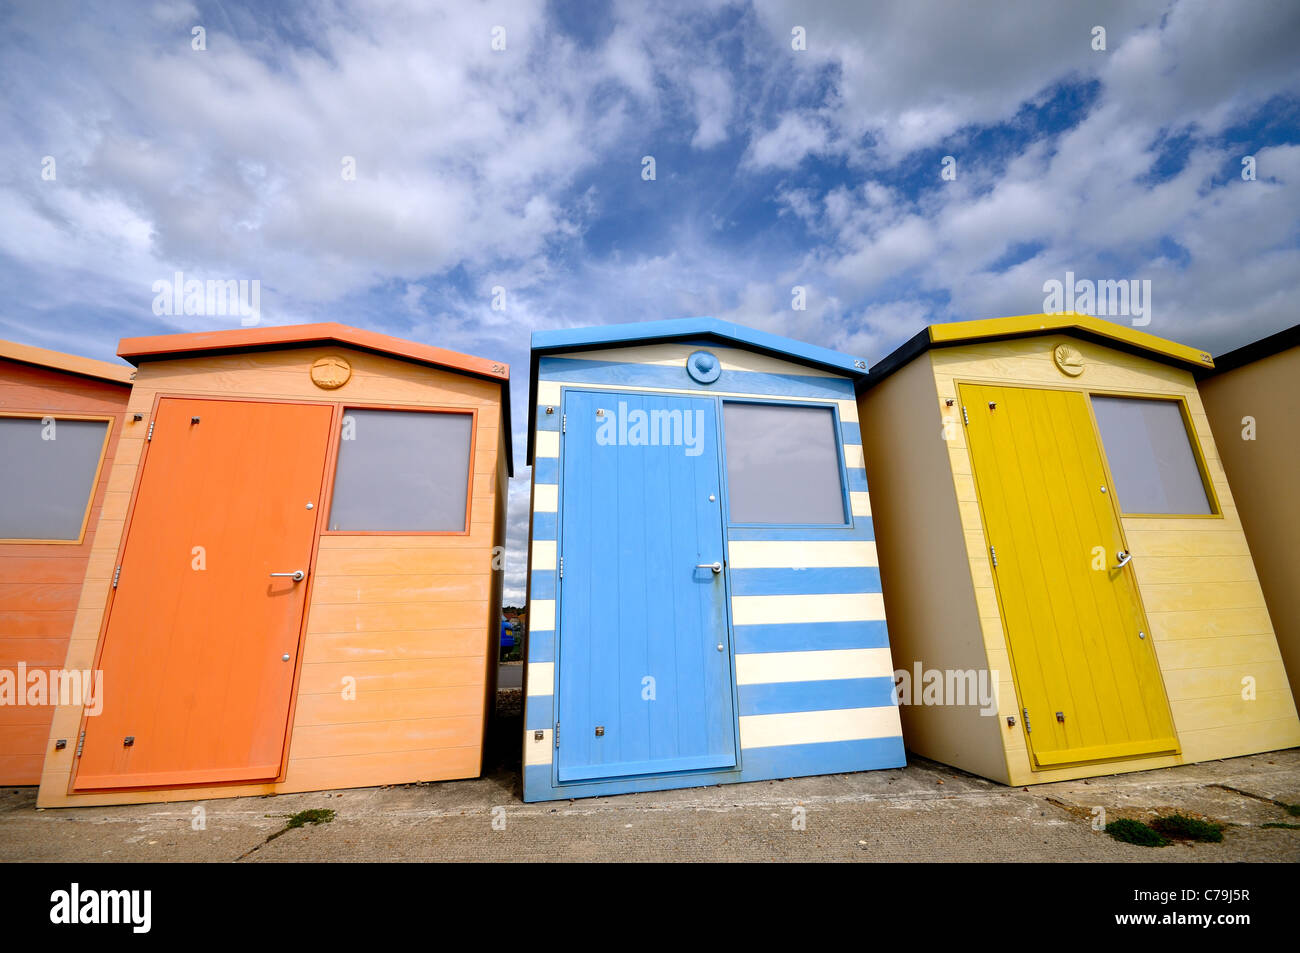 Colourful beach huts at a British seaside - Stock Image